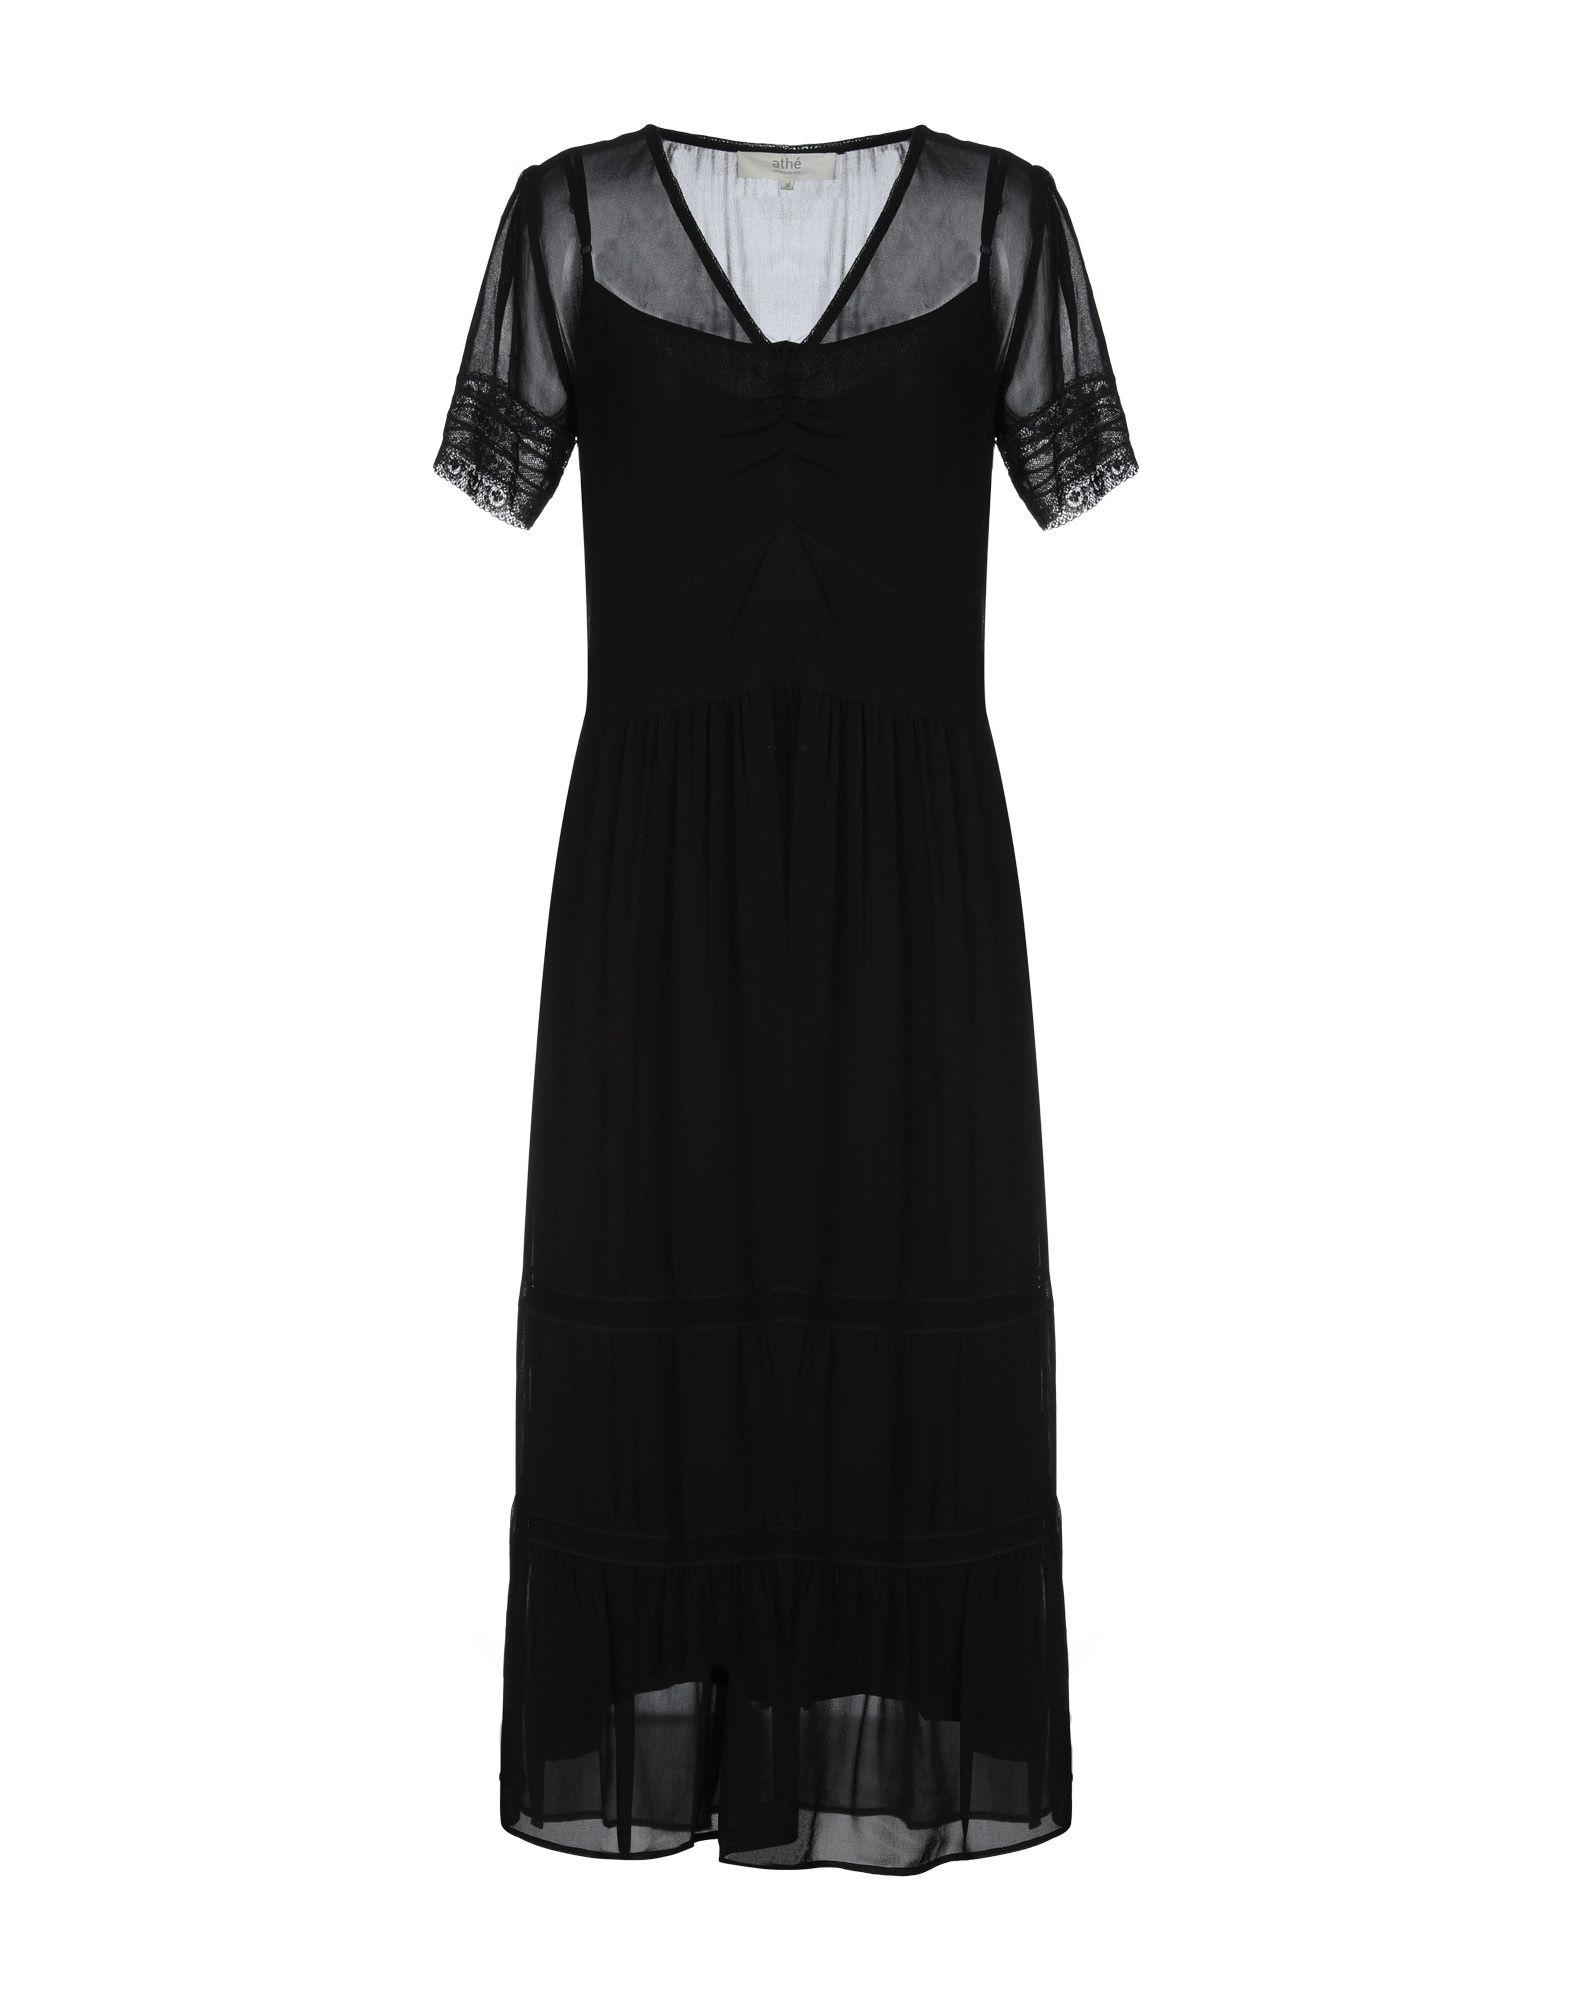 VANESSA BRUNO ATHE' Платье длиной 3/4 bruno 16фруктовница в стиле барроко ландыши